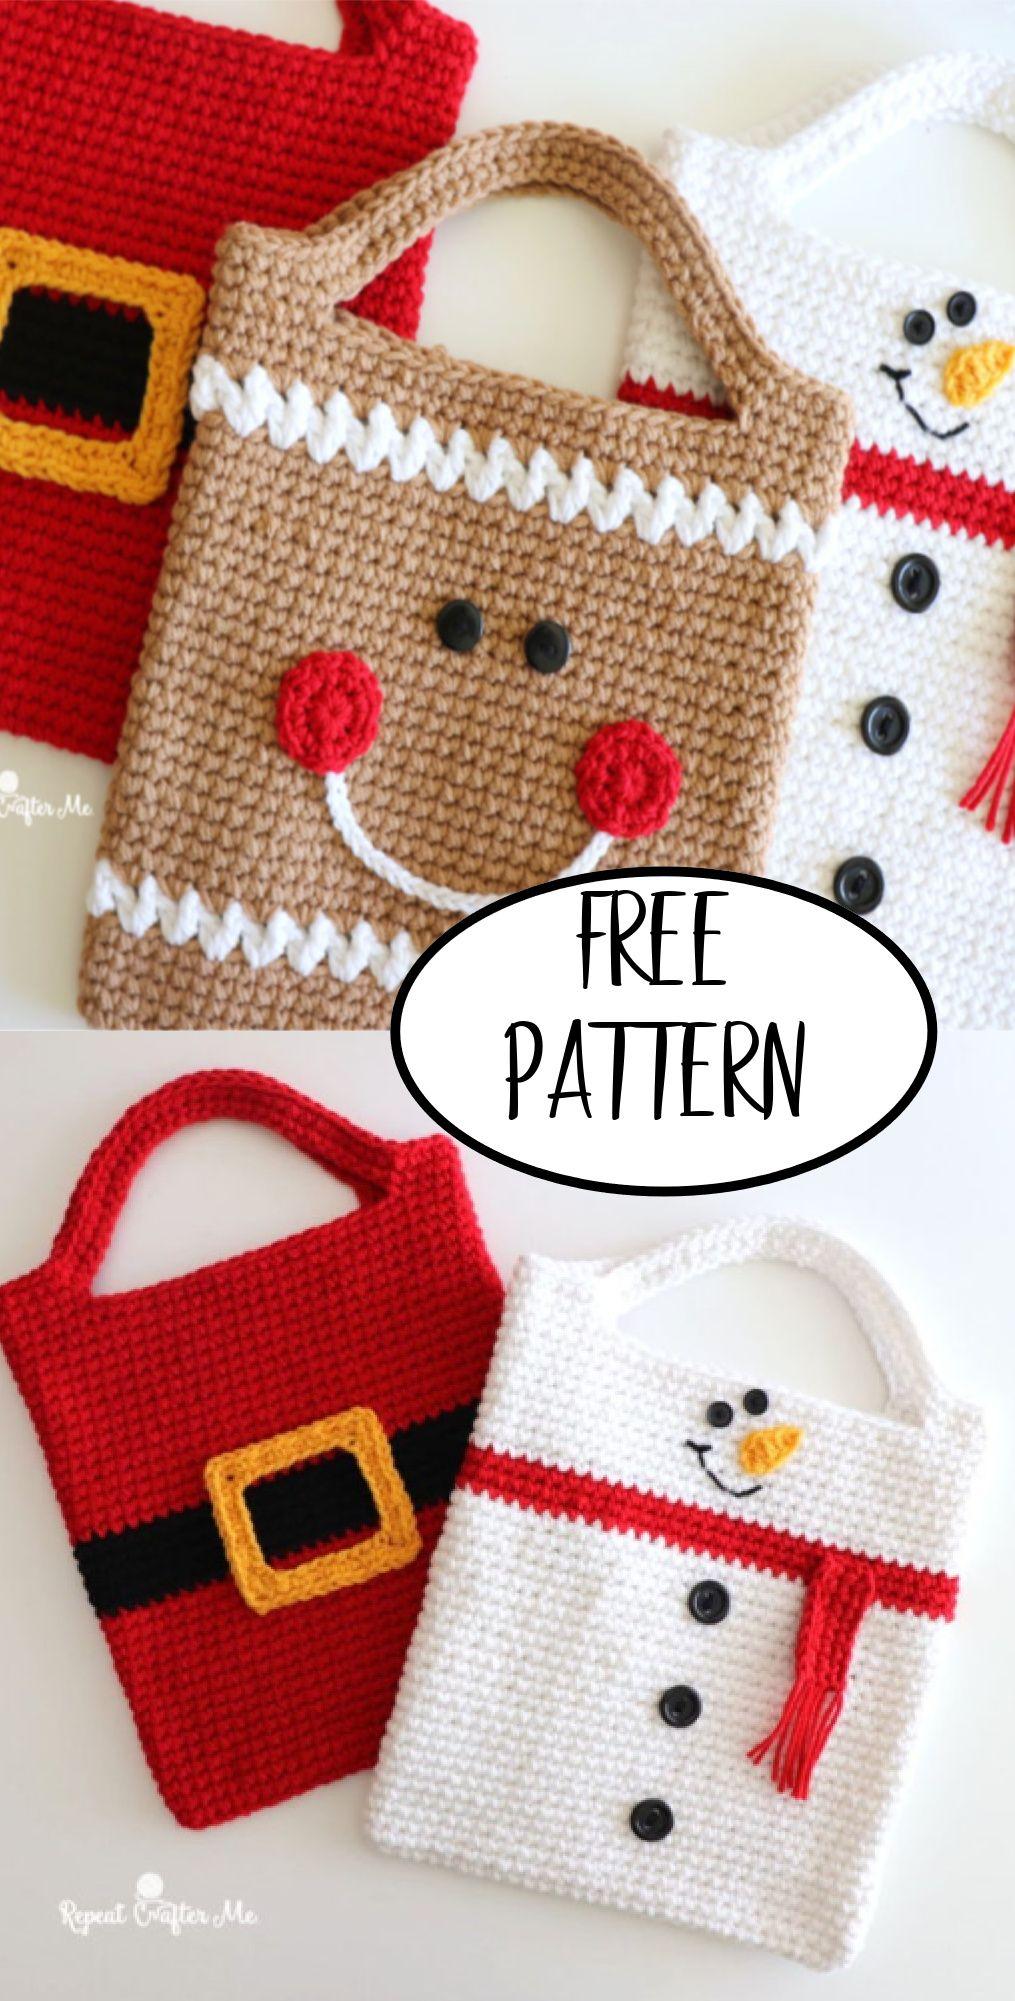 Christmas Tote Bags Free Crochet Pattern Nana S Favorites Christmas Tote Crochet Christmas Gifts Christmas Tote Bags